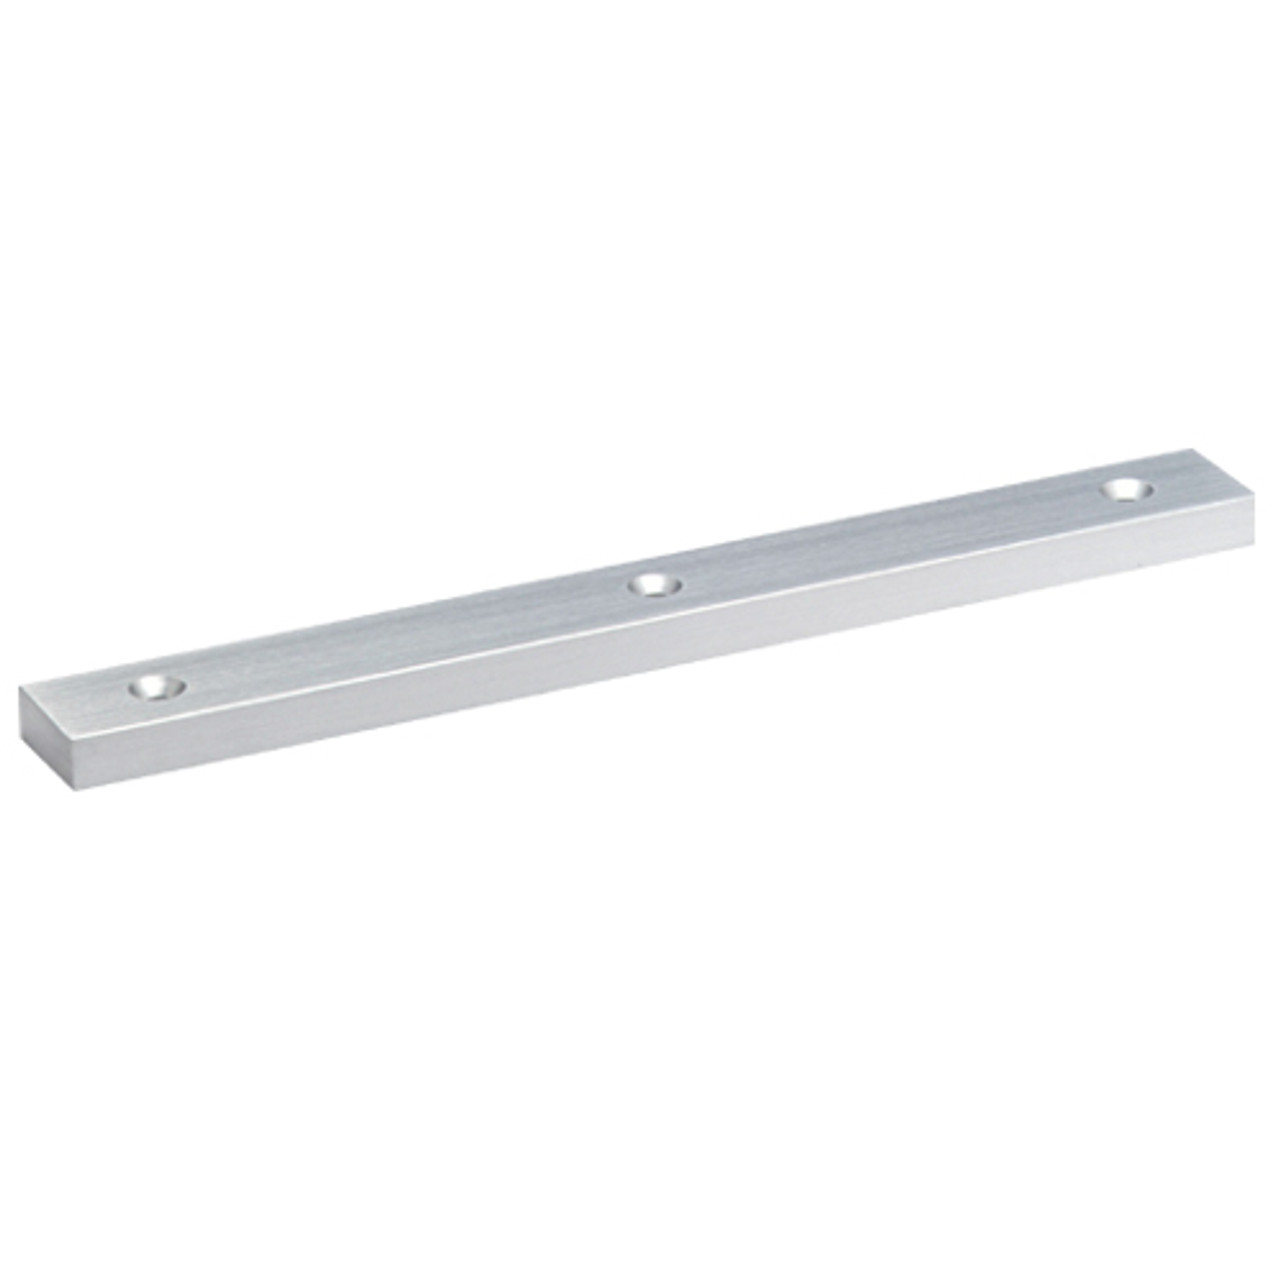 4111-US26 DynaLock 4000 Series Filler Plates for Single Maglocks in Bright Chrome